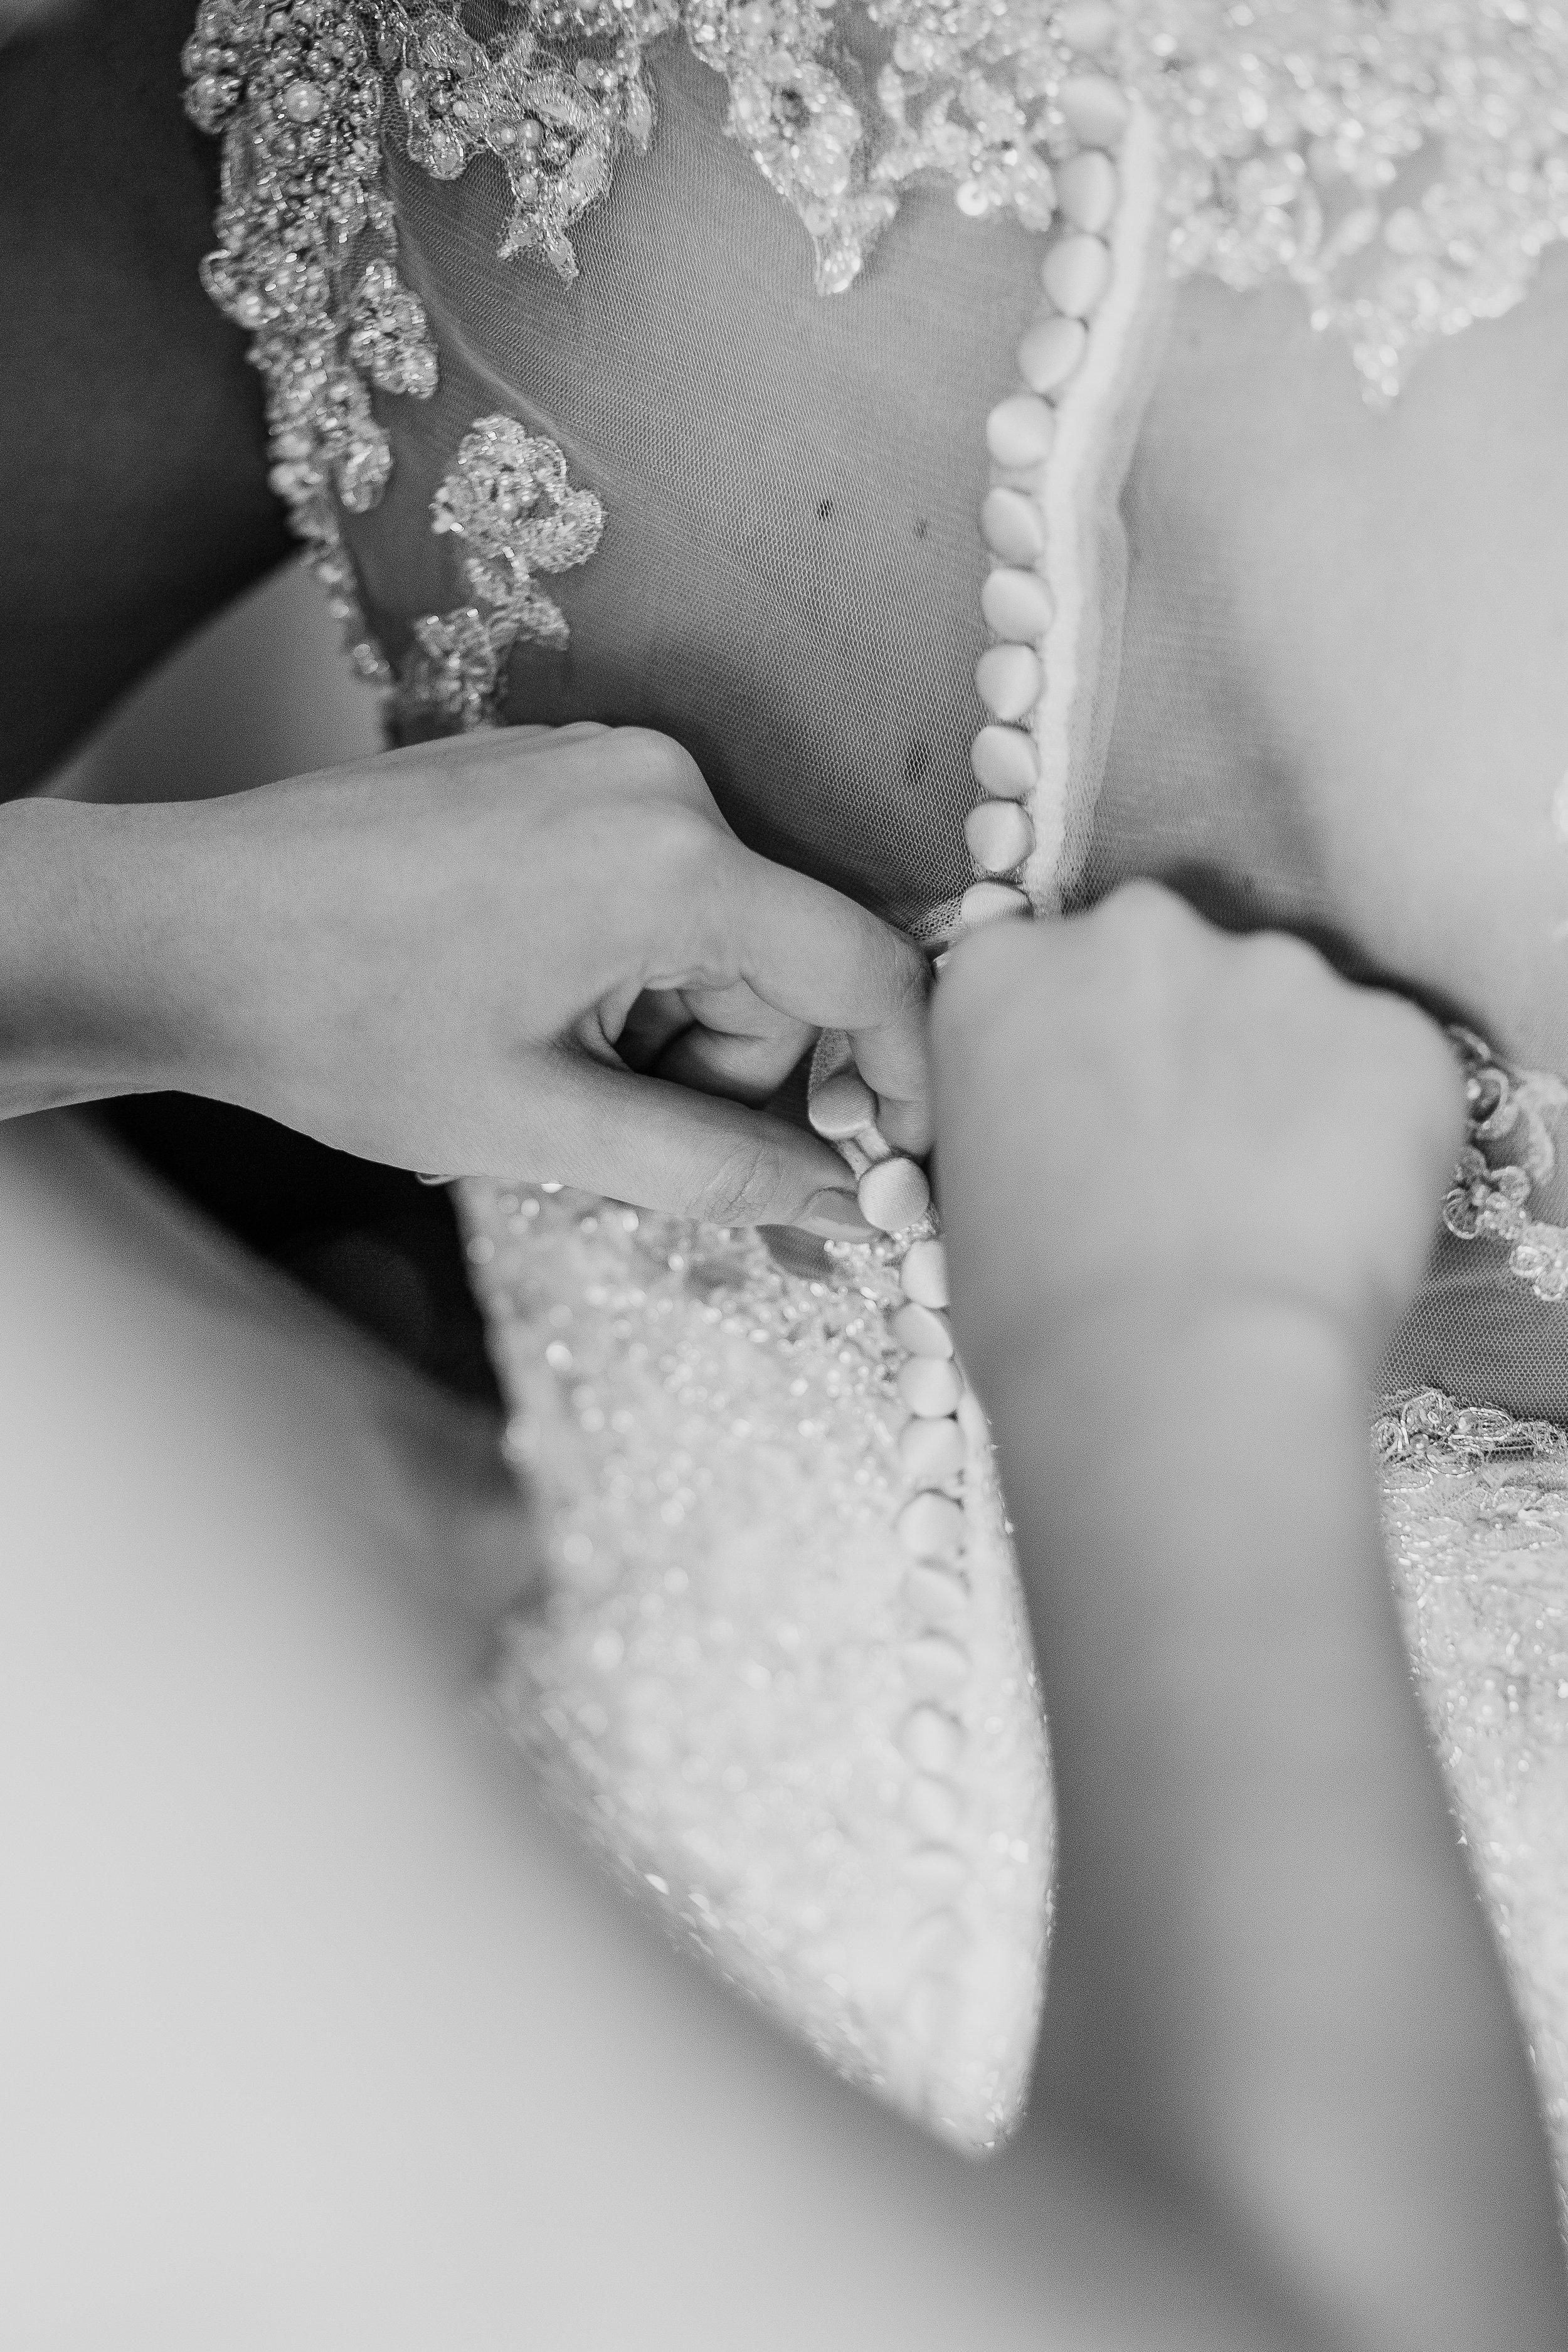 Photo by  Wedding Photography  on  Unsplash